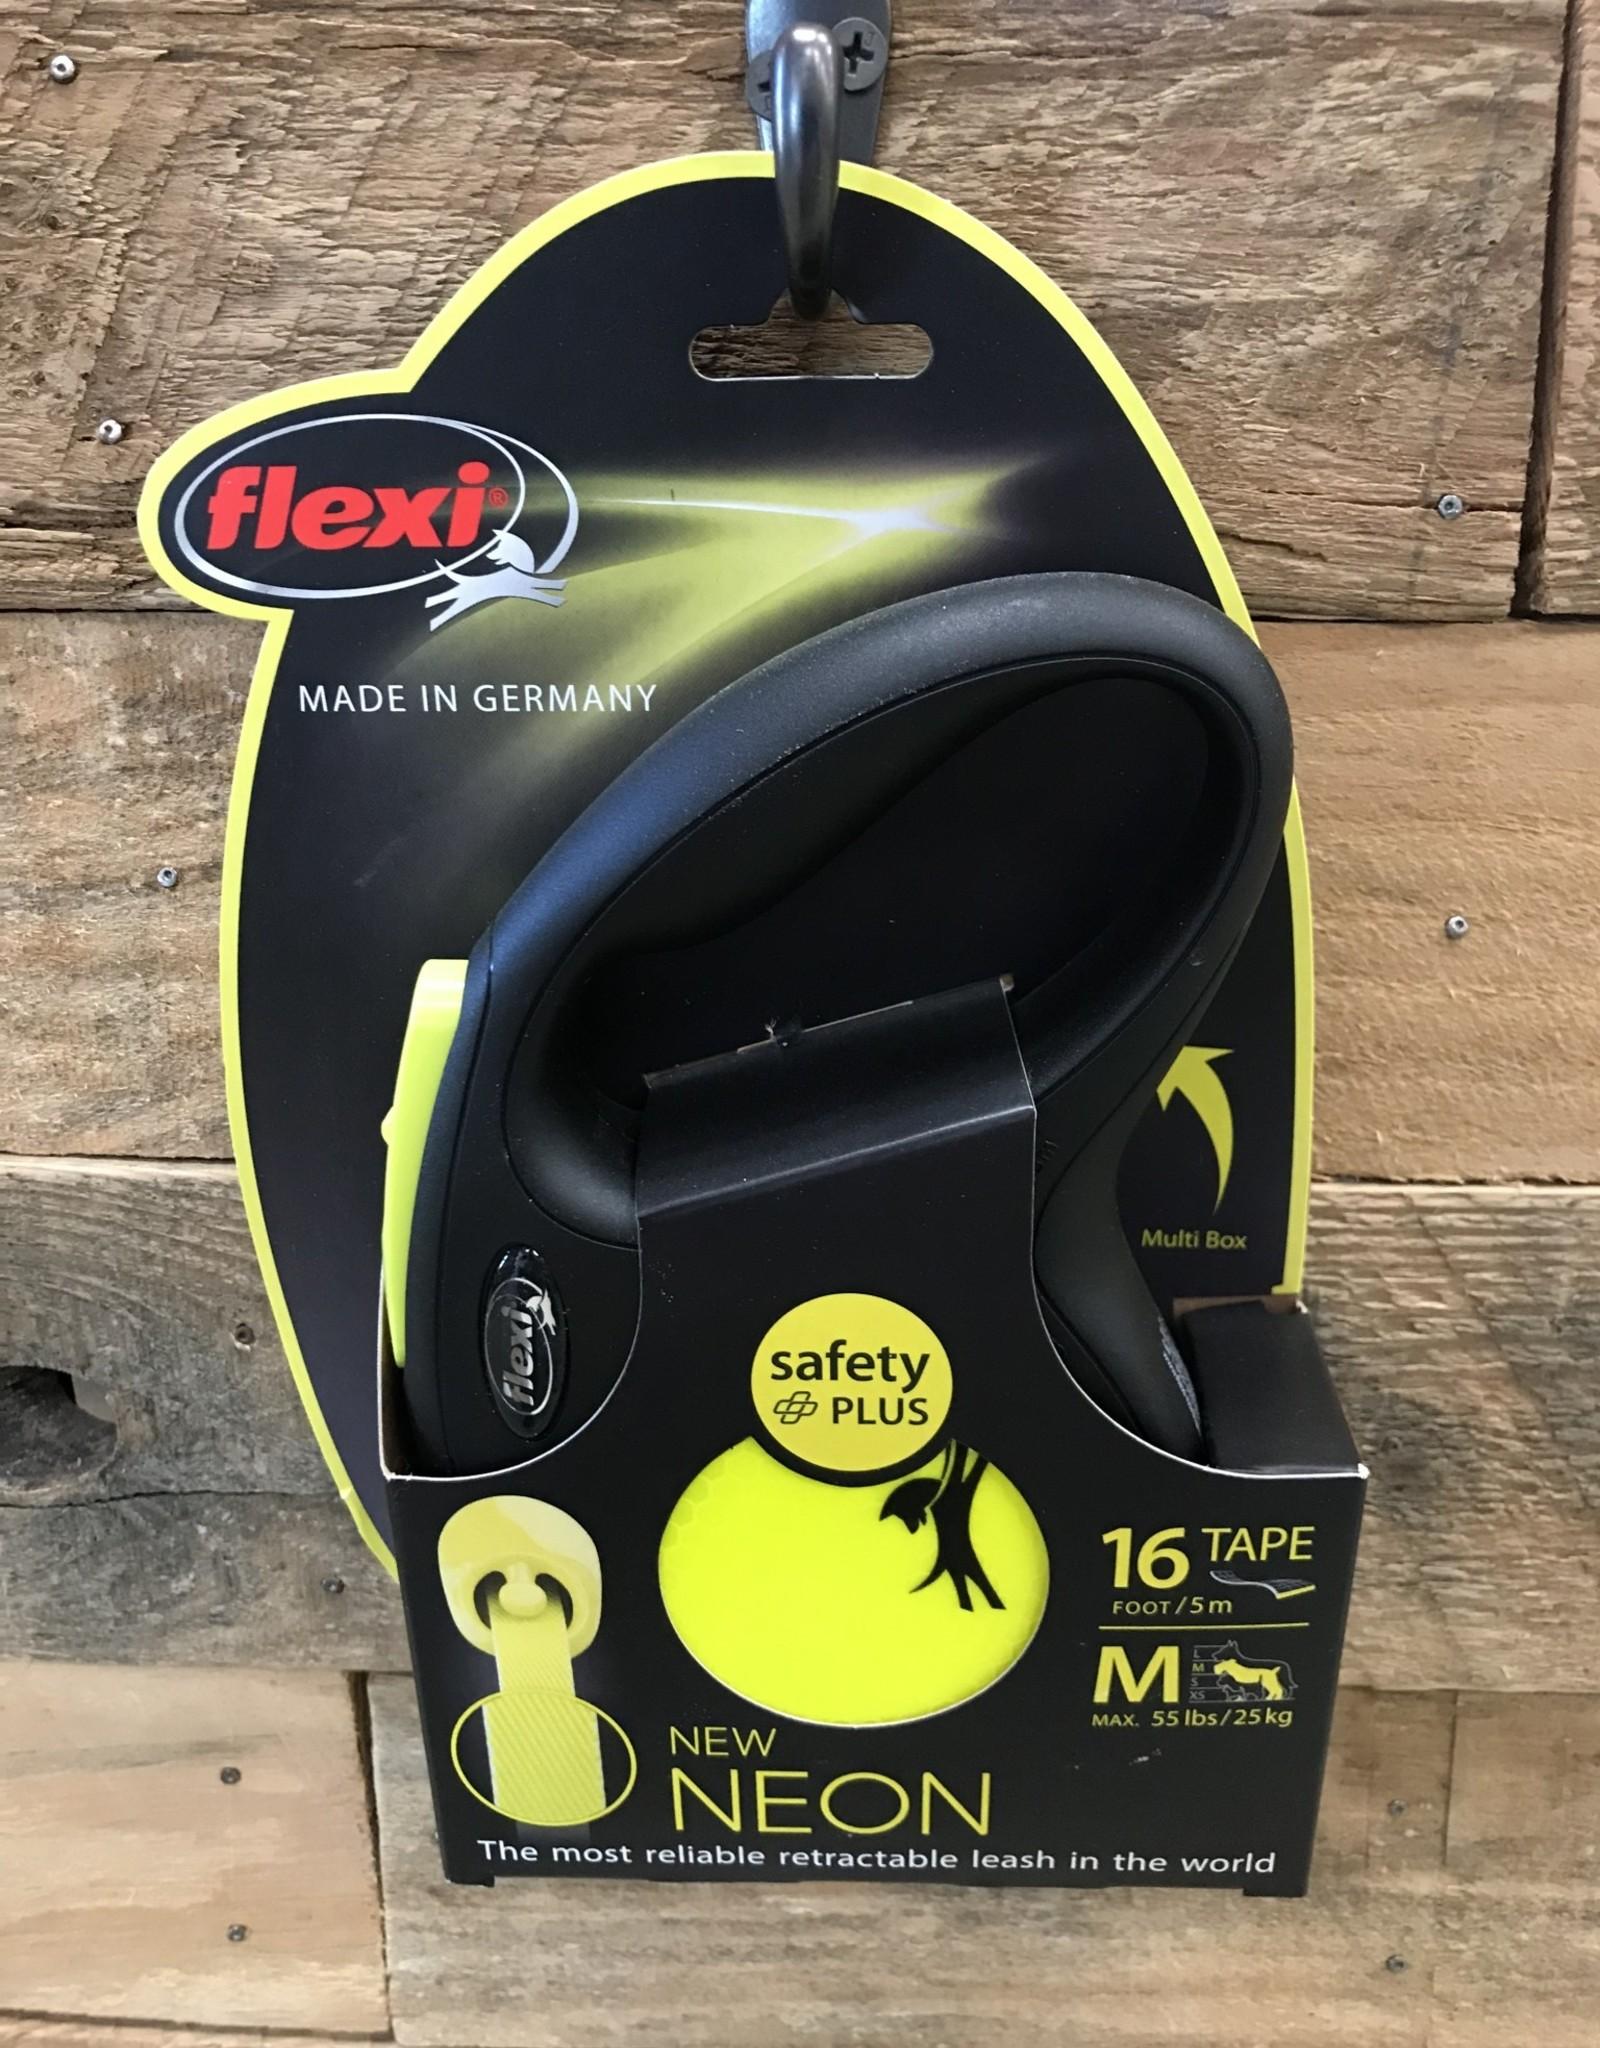 FLEXI YELLOW NEON REFLECT med